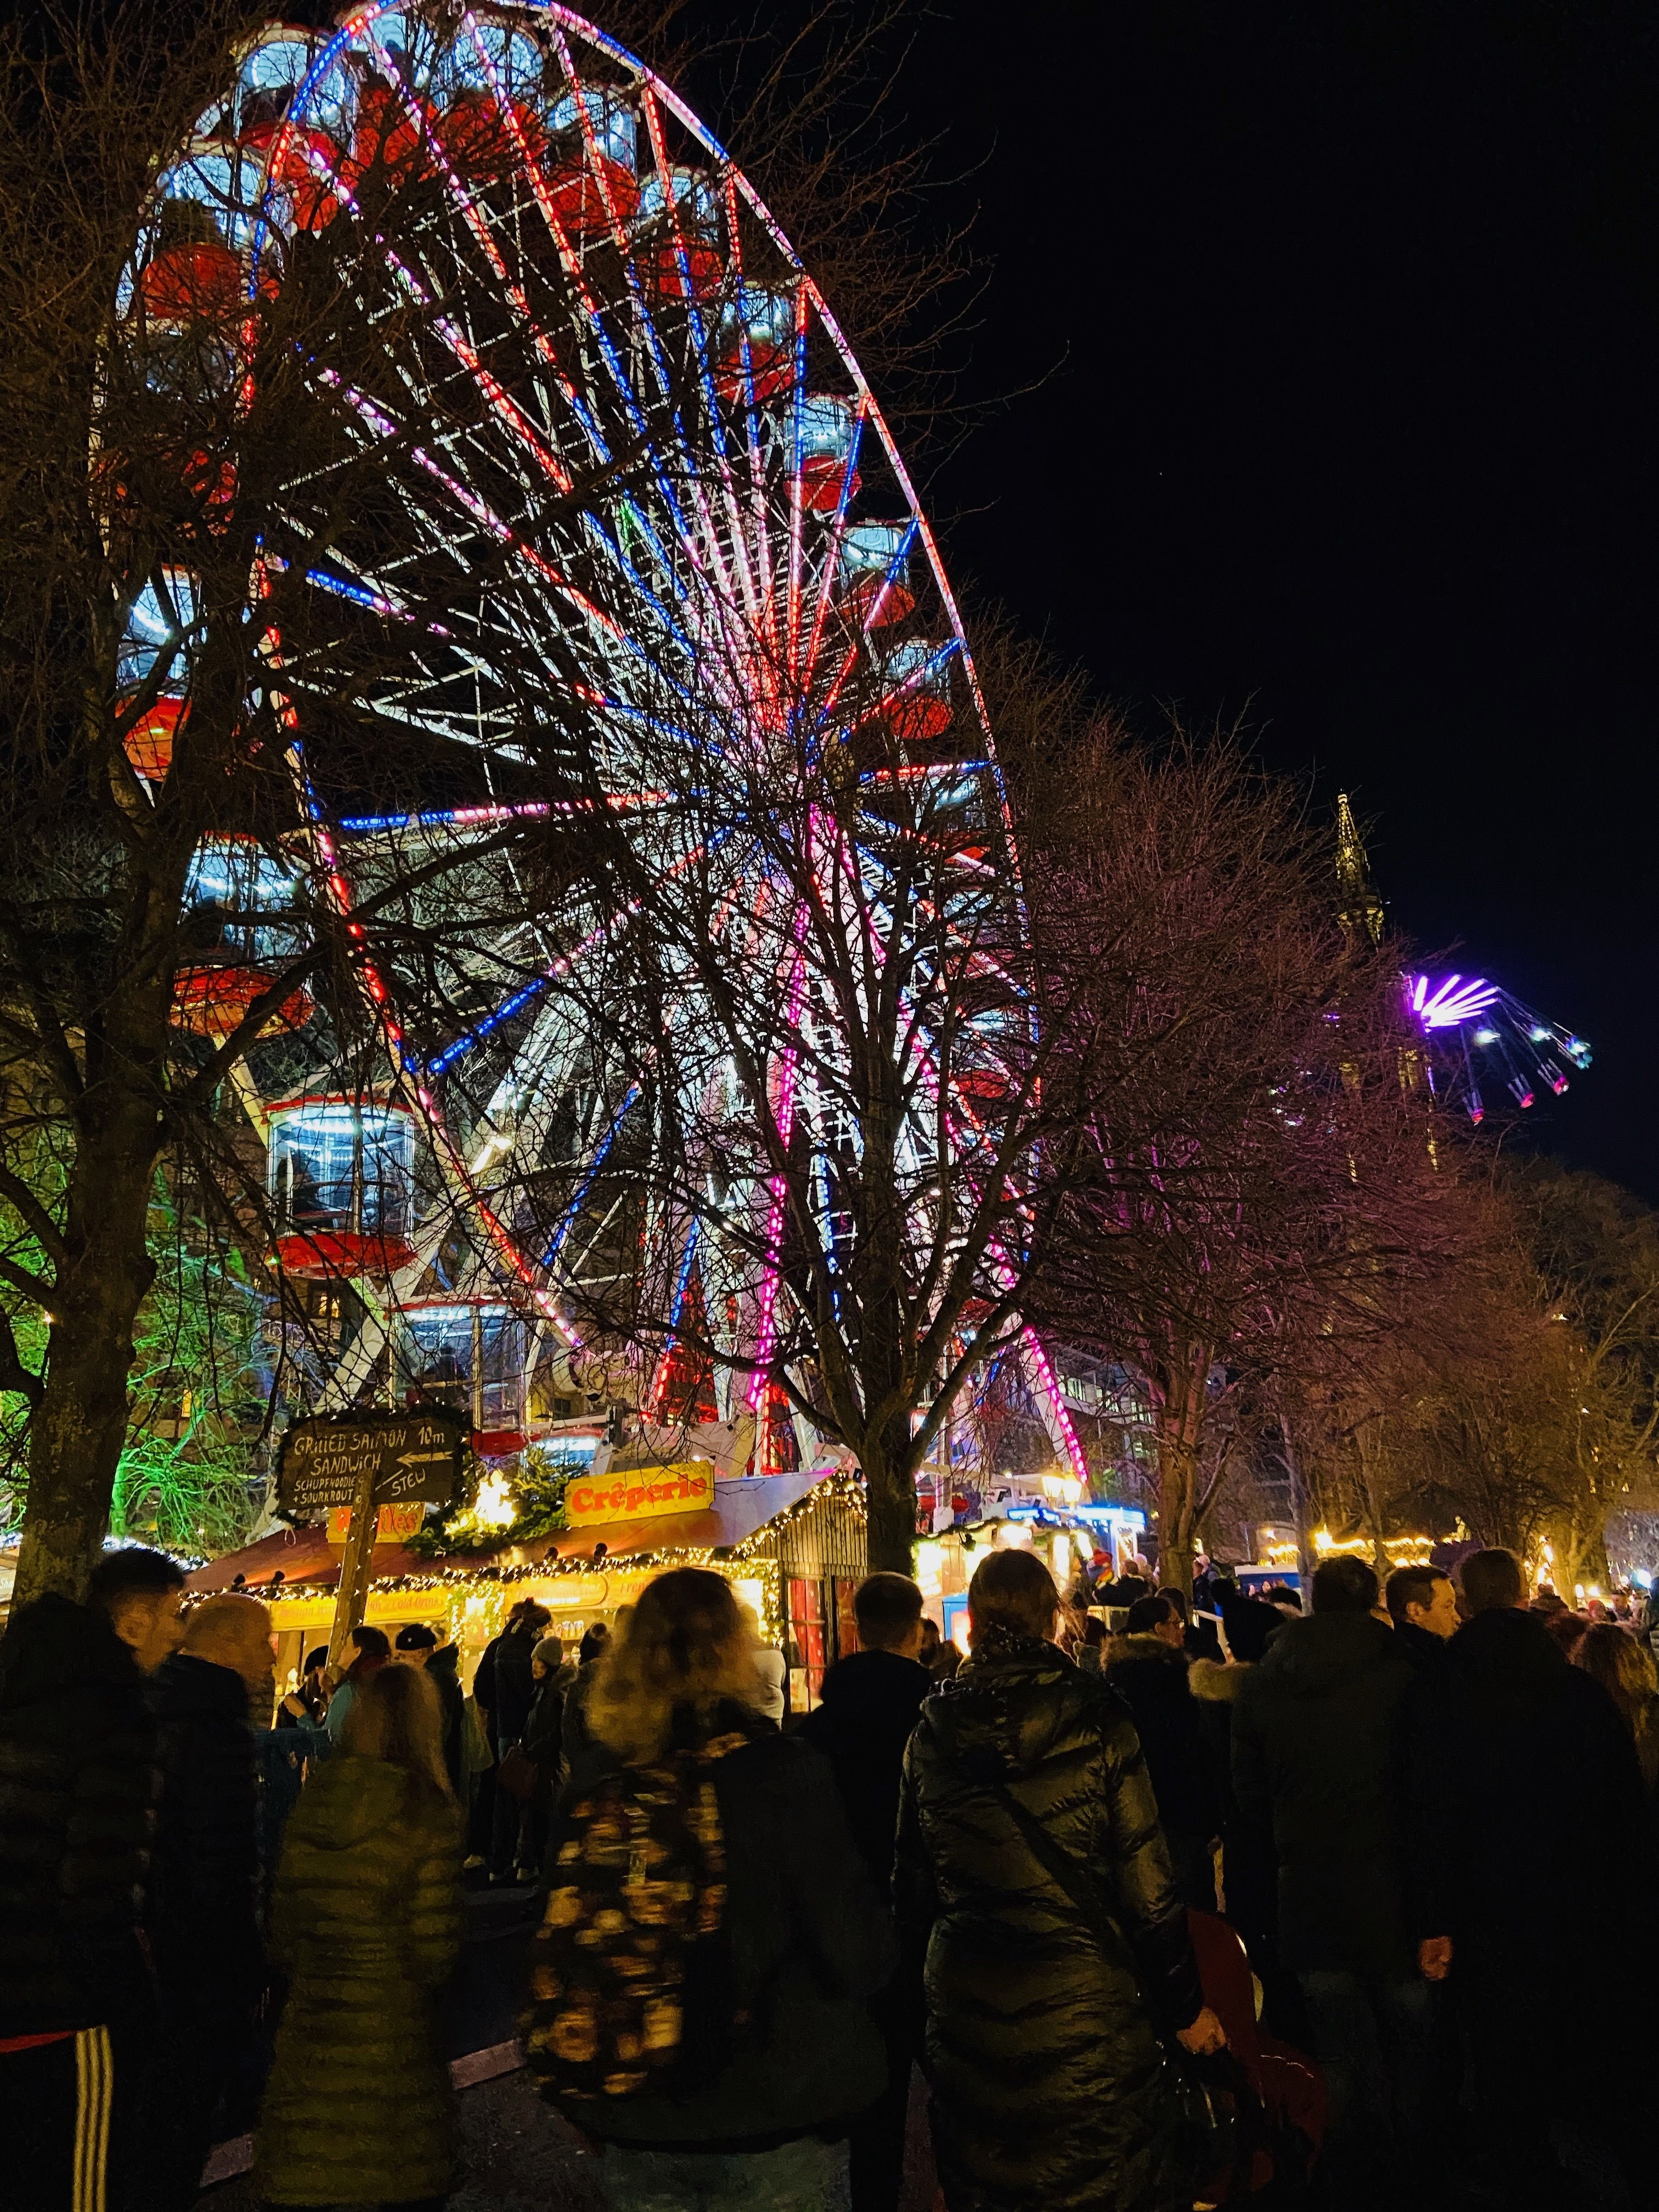 26 Festive Things To Do In Edinburgh In Winter In 2020 Edinburgh Travel Edinburgh Christmas Edinburgh Scotland Travel